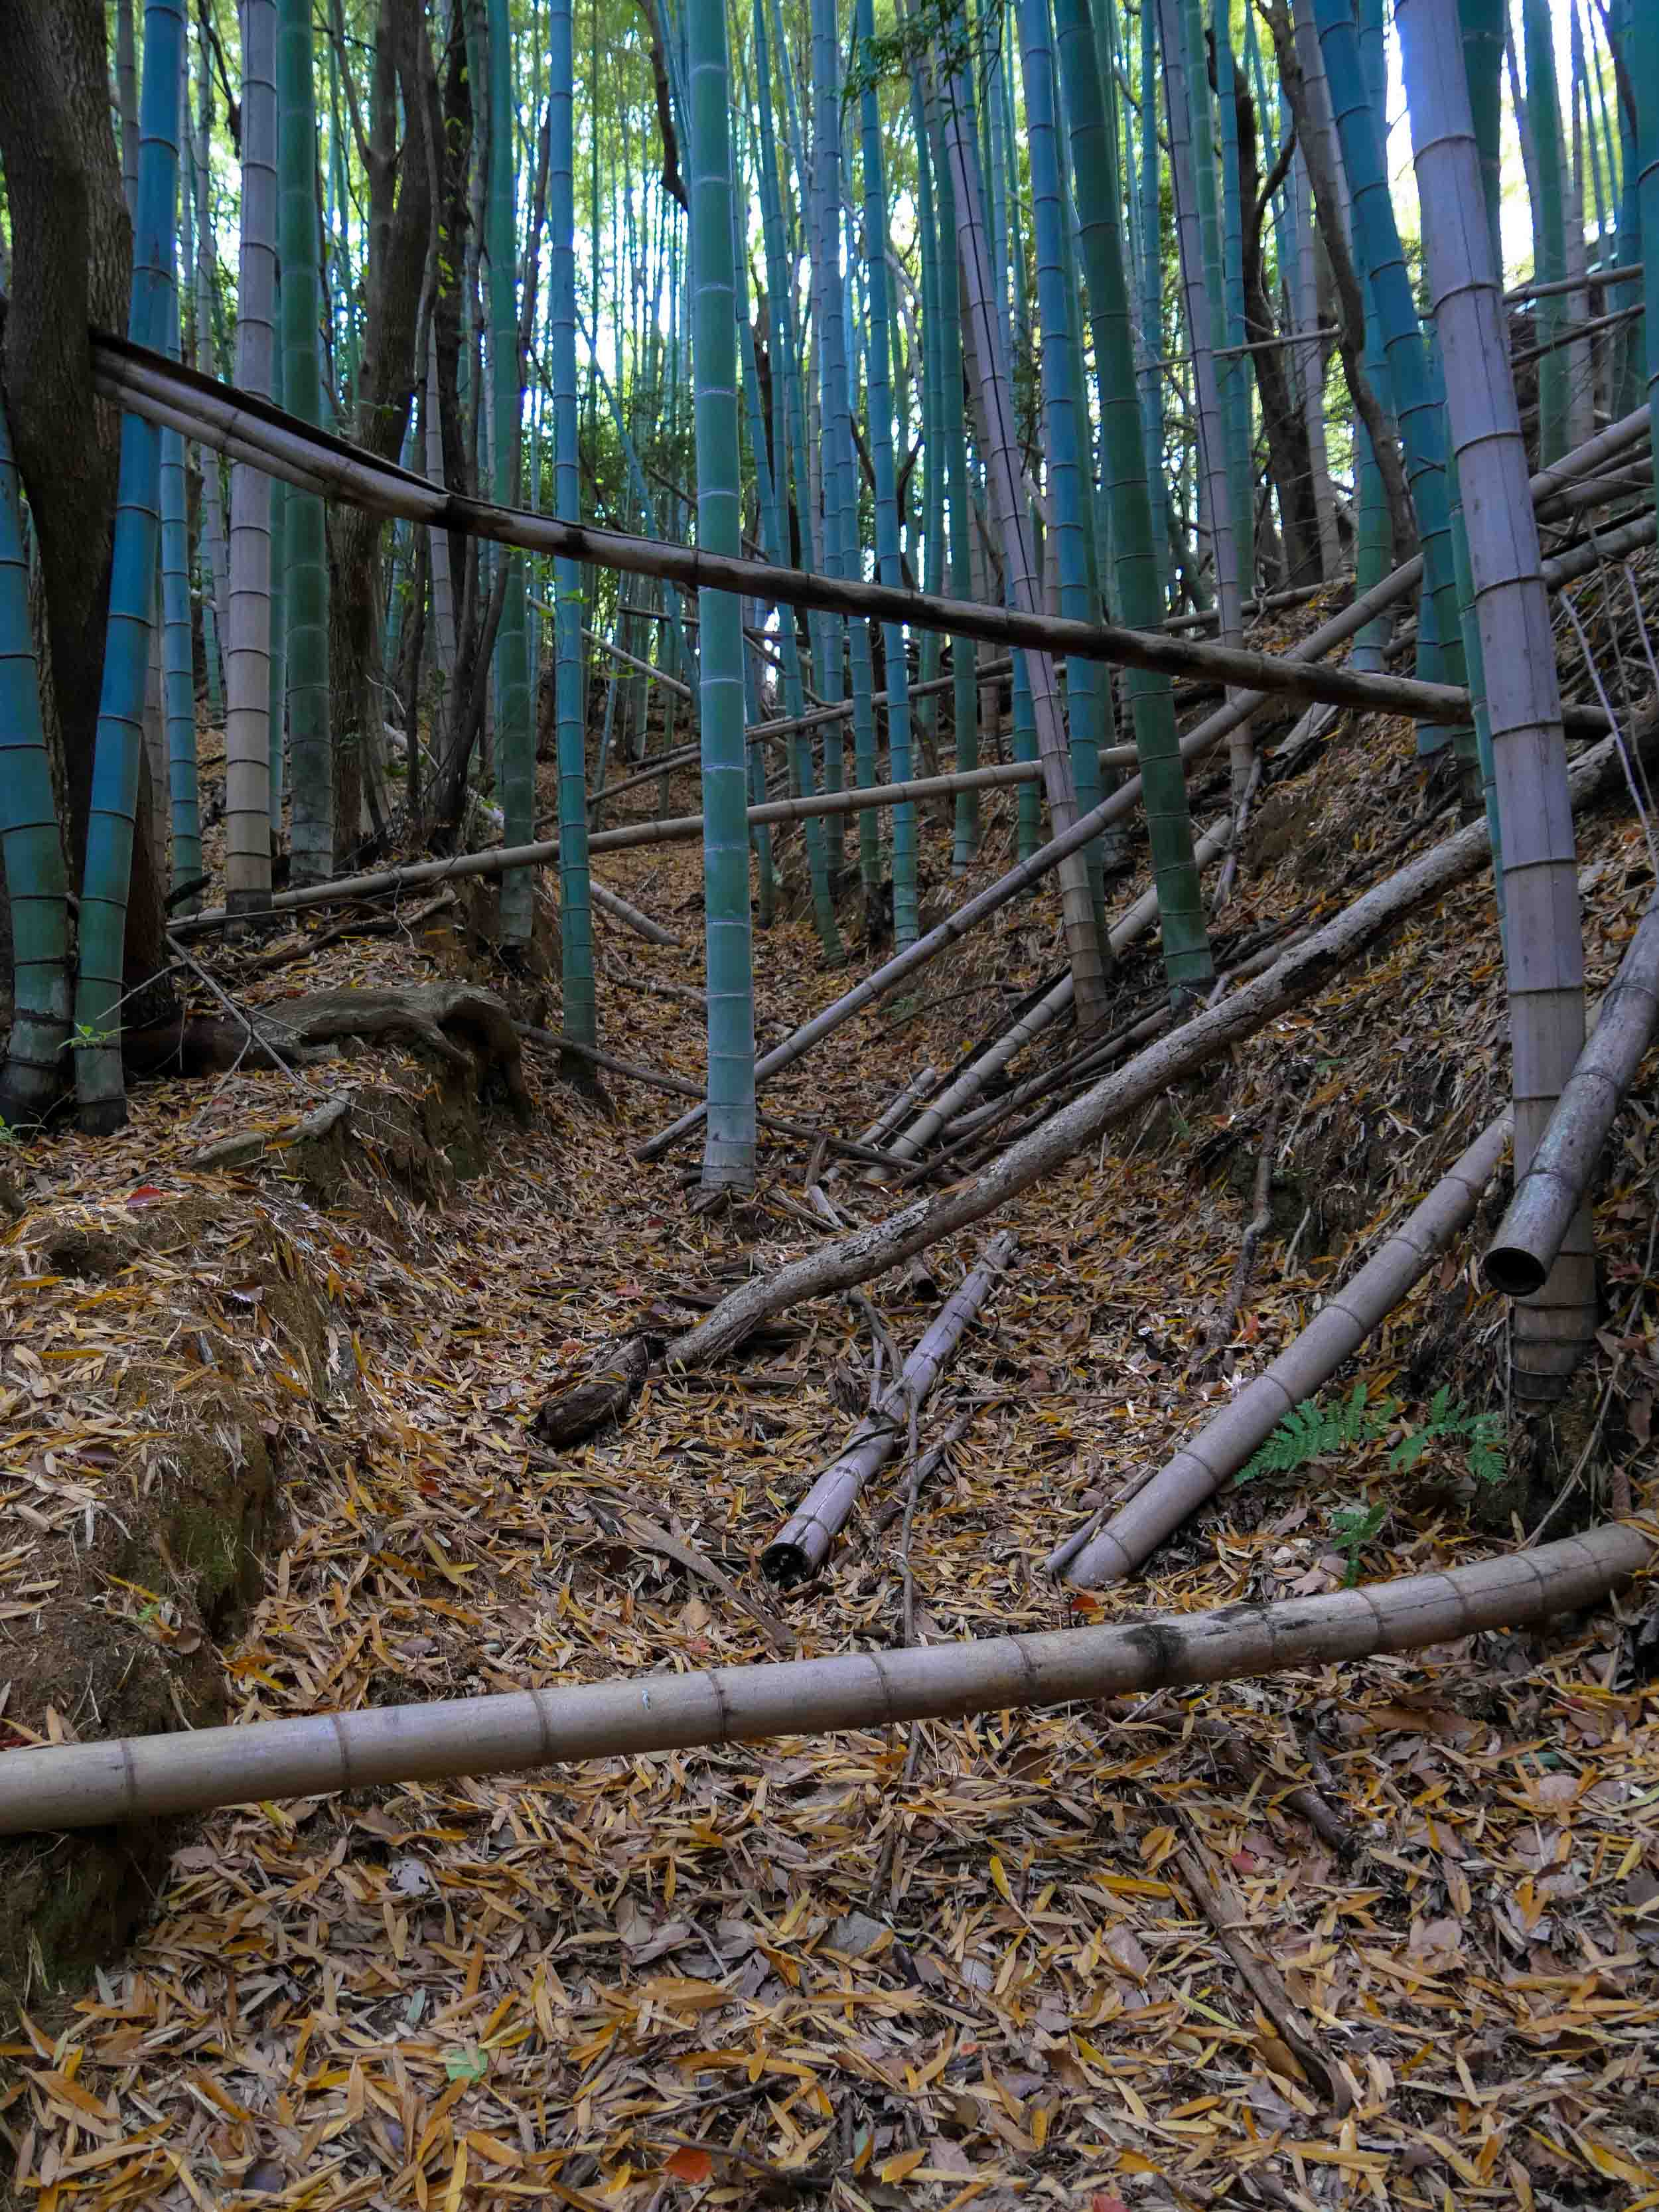 matsuyama-dougo-onsen-30.jpg